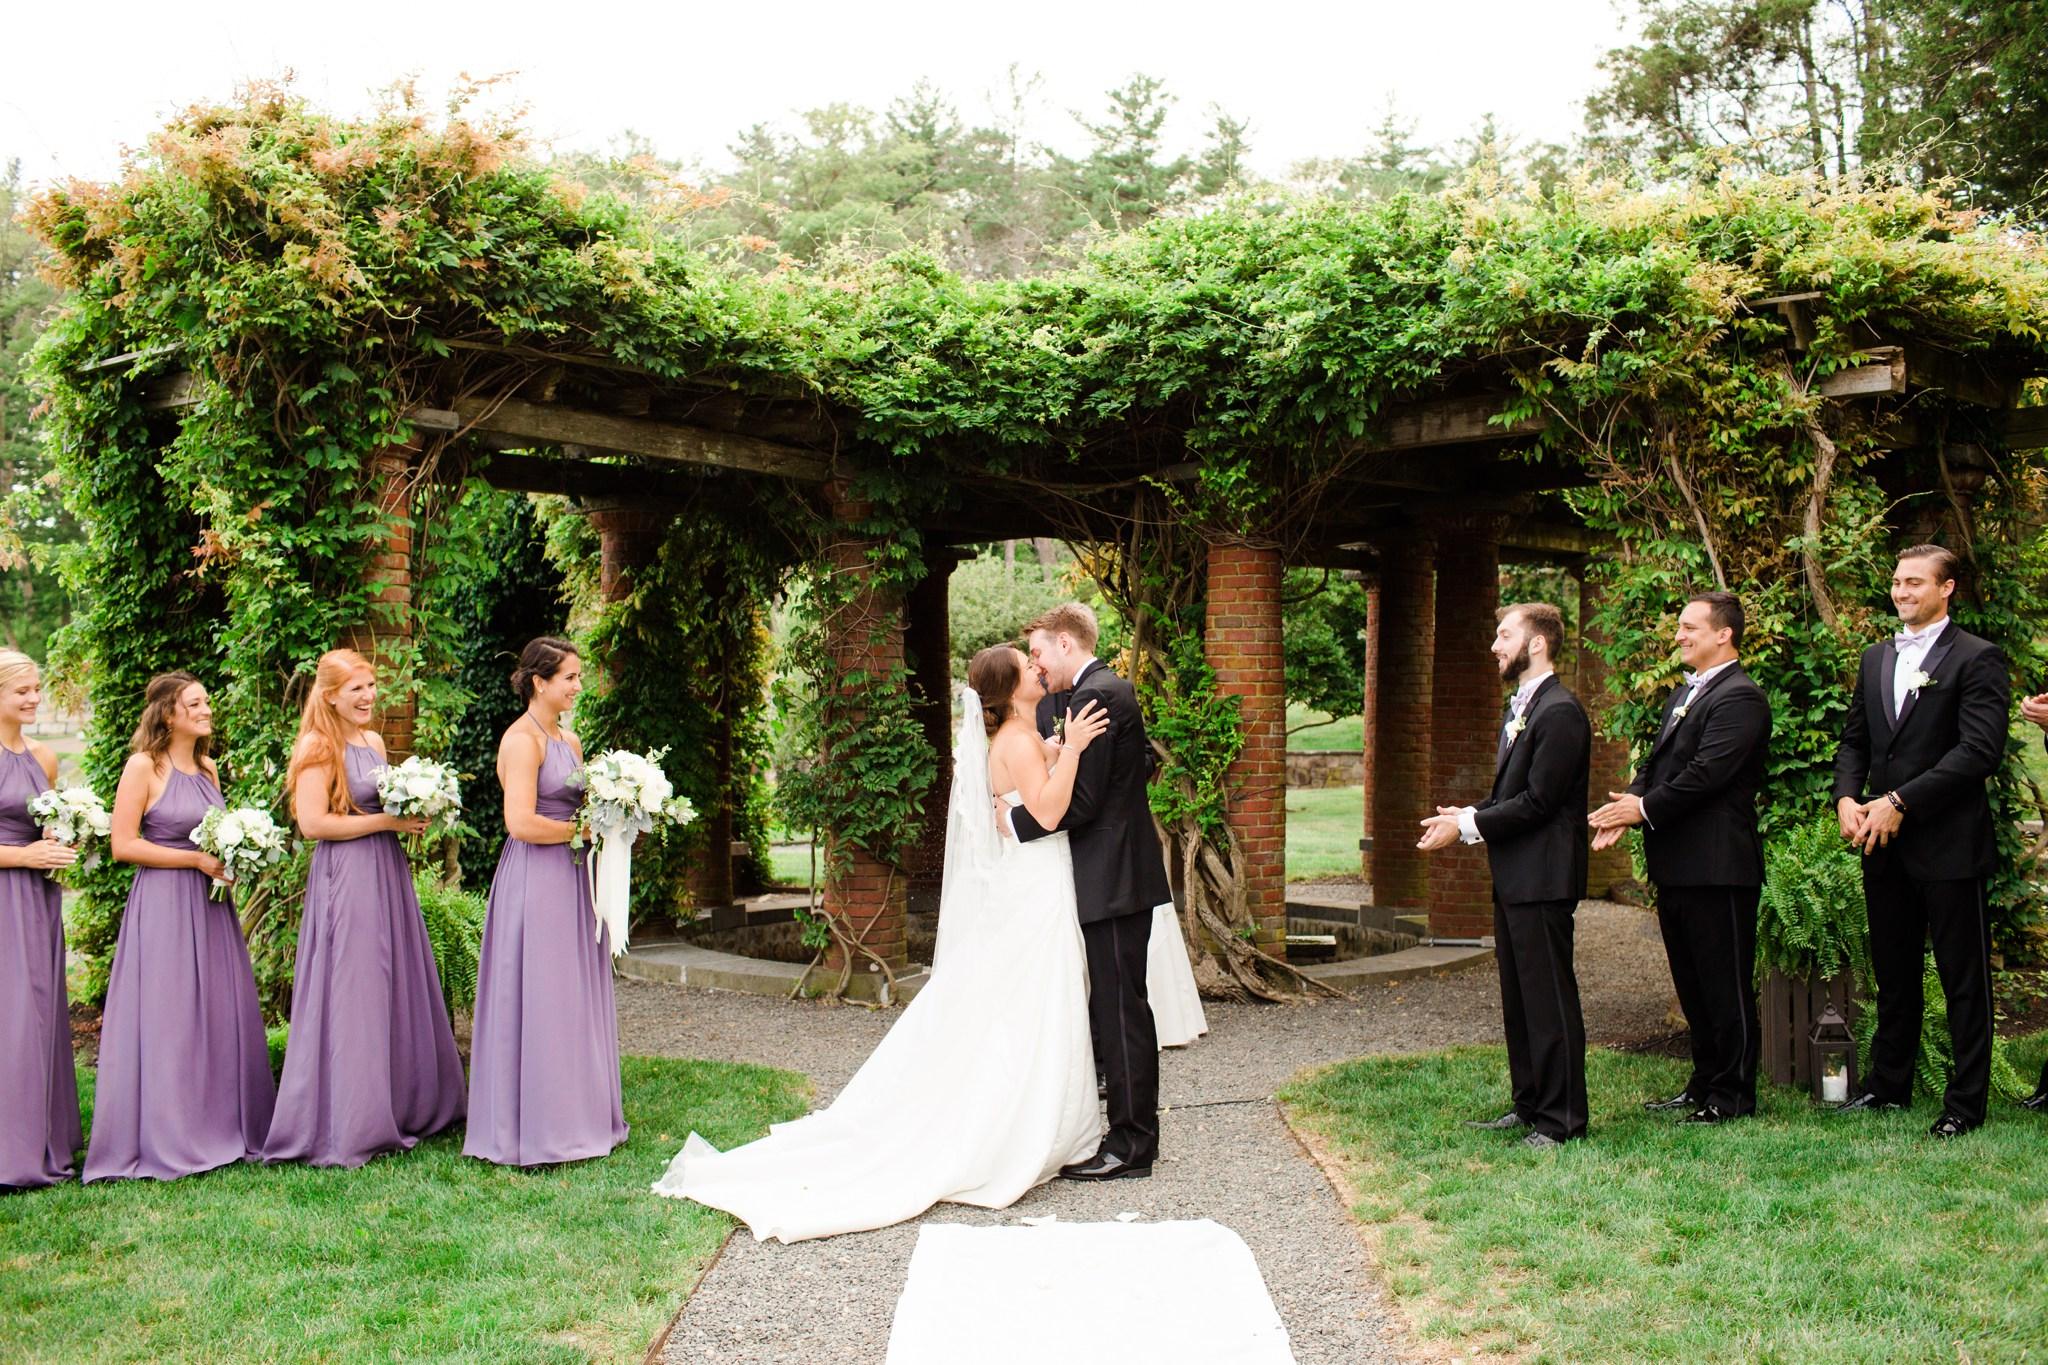 turner_hill_wedding_photos_00038.JPG